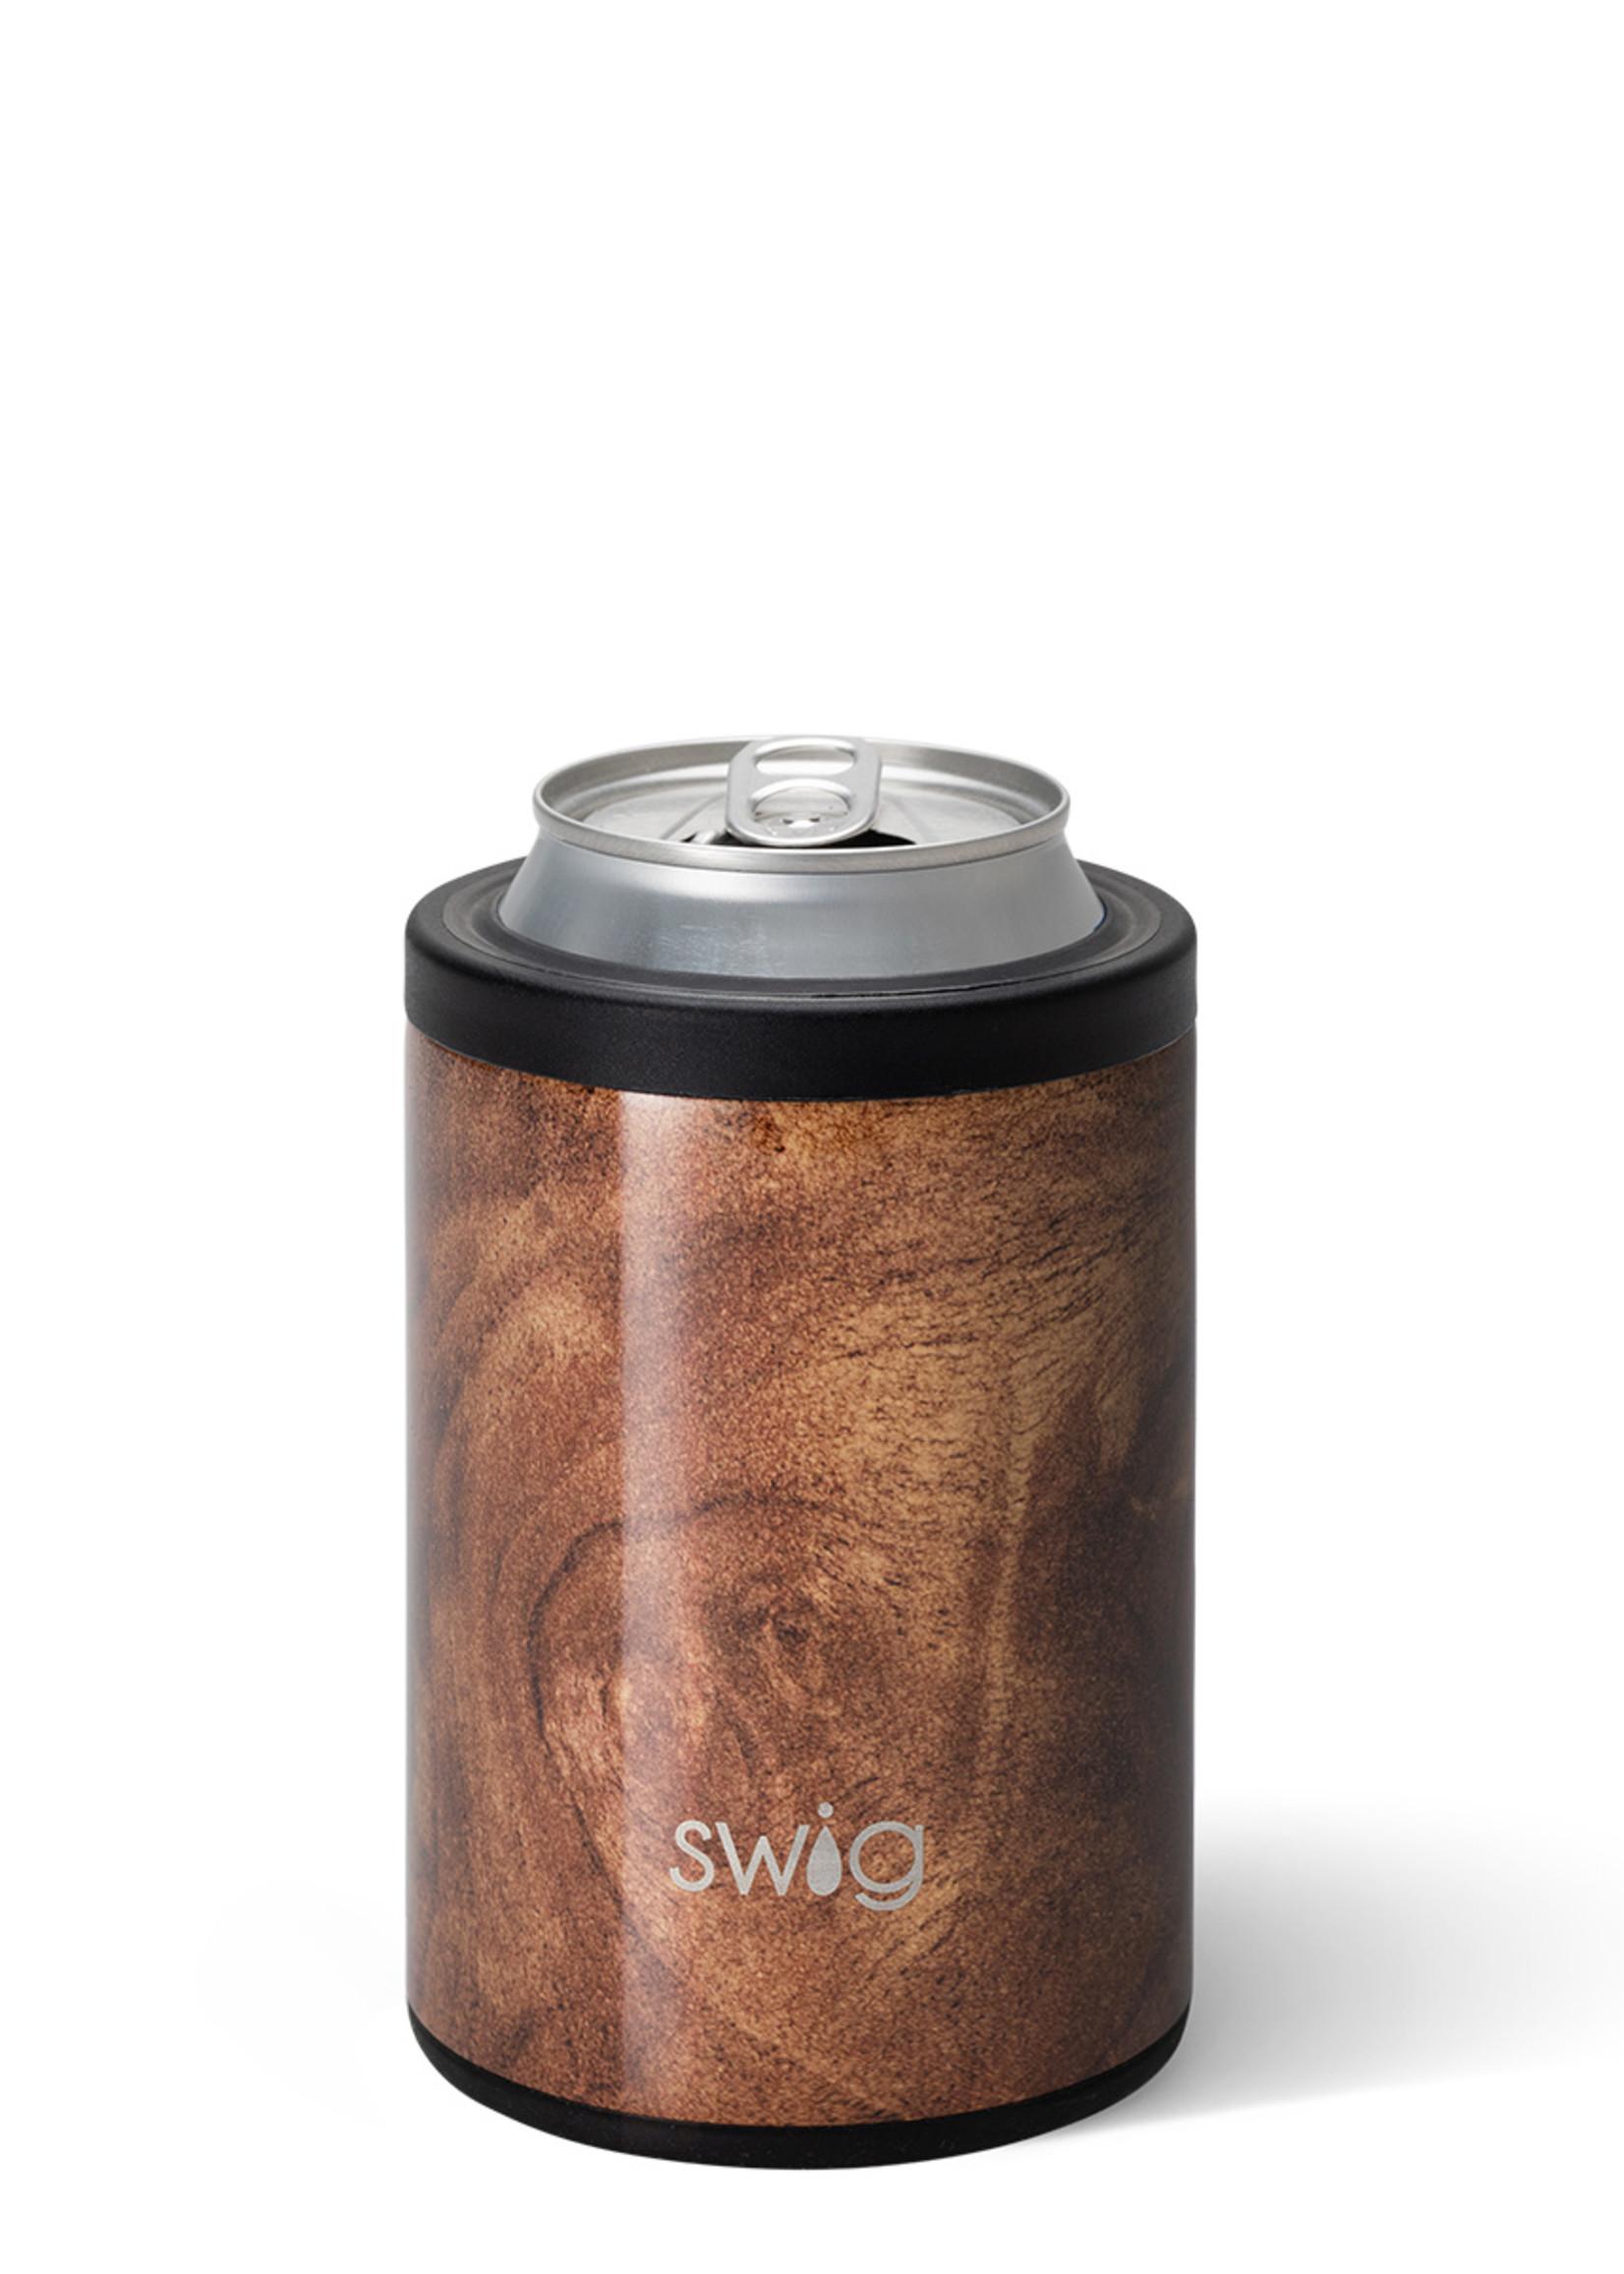 Swig BLACK WALNUT SWIG 12OZ COMBO COOLER